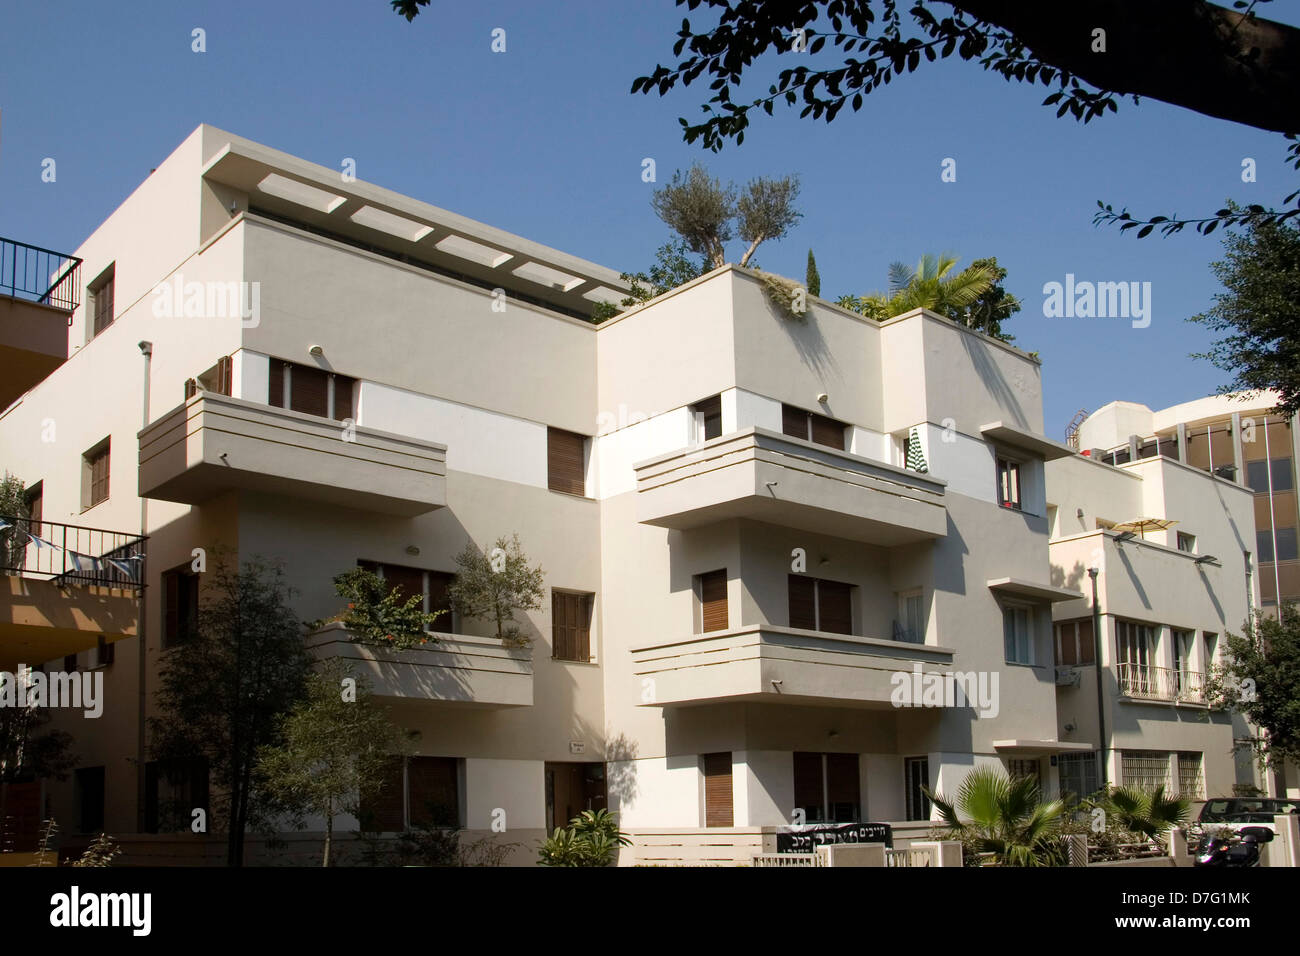 bauhaus architecture in rothschild boulevard, tel aviv Stock Photo